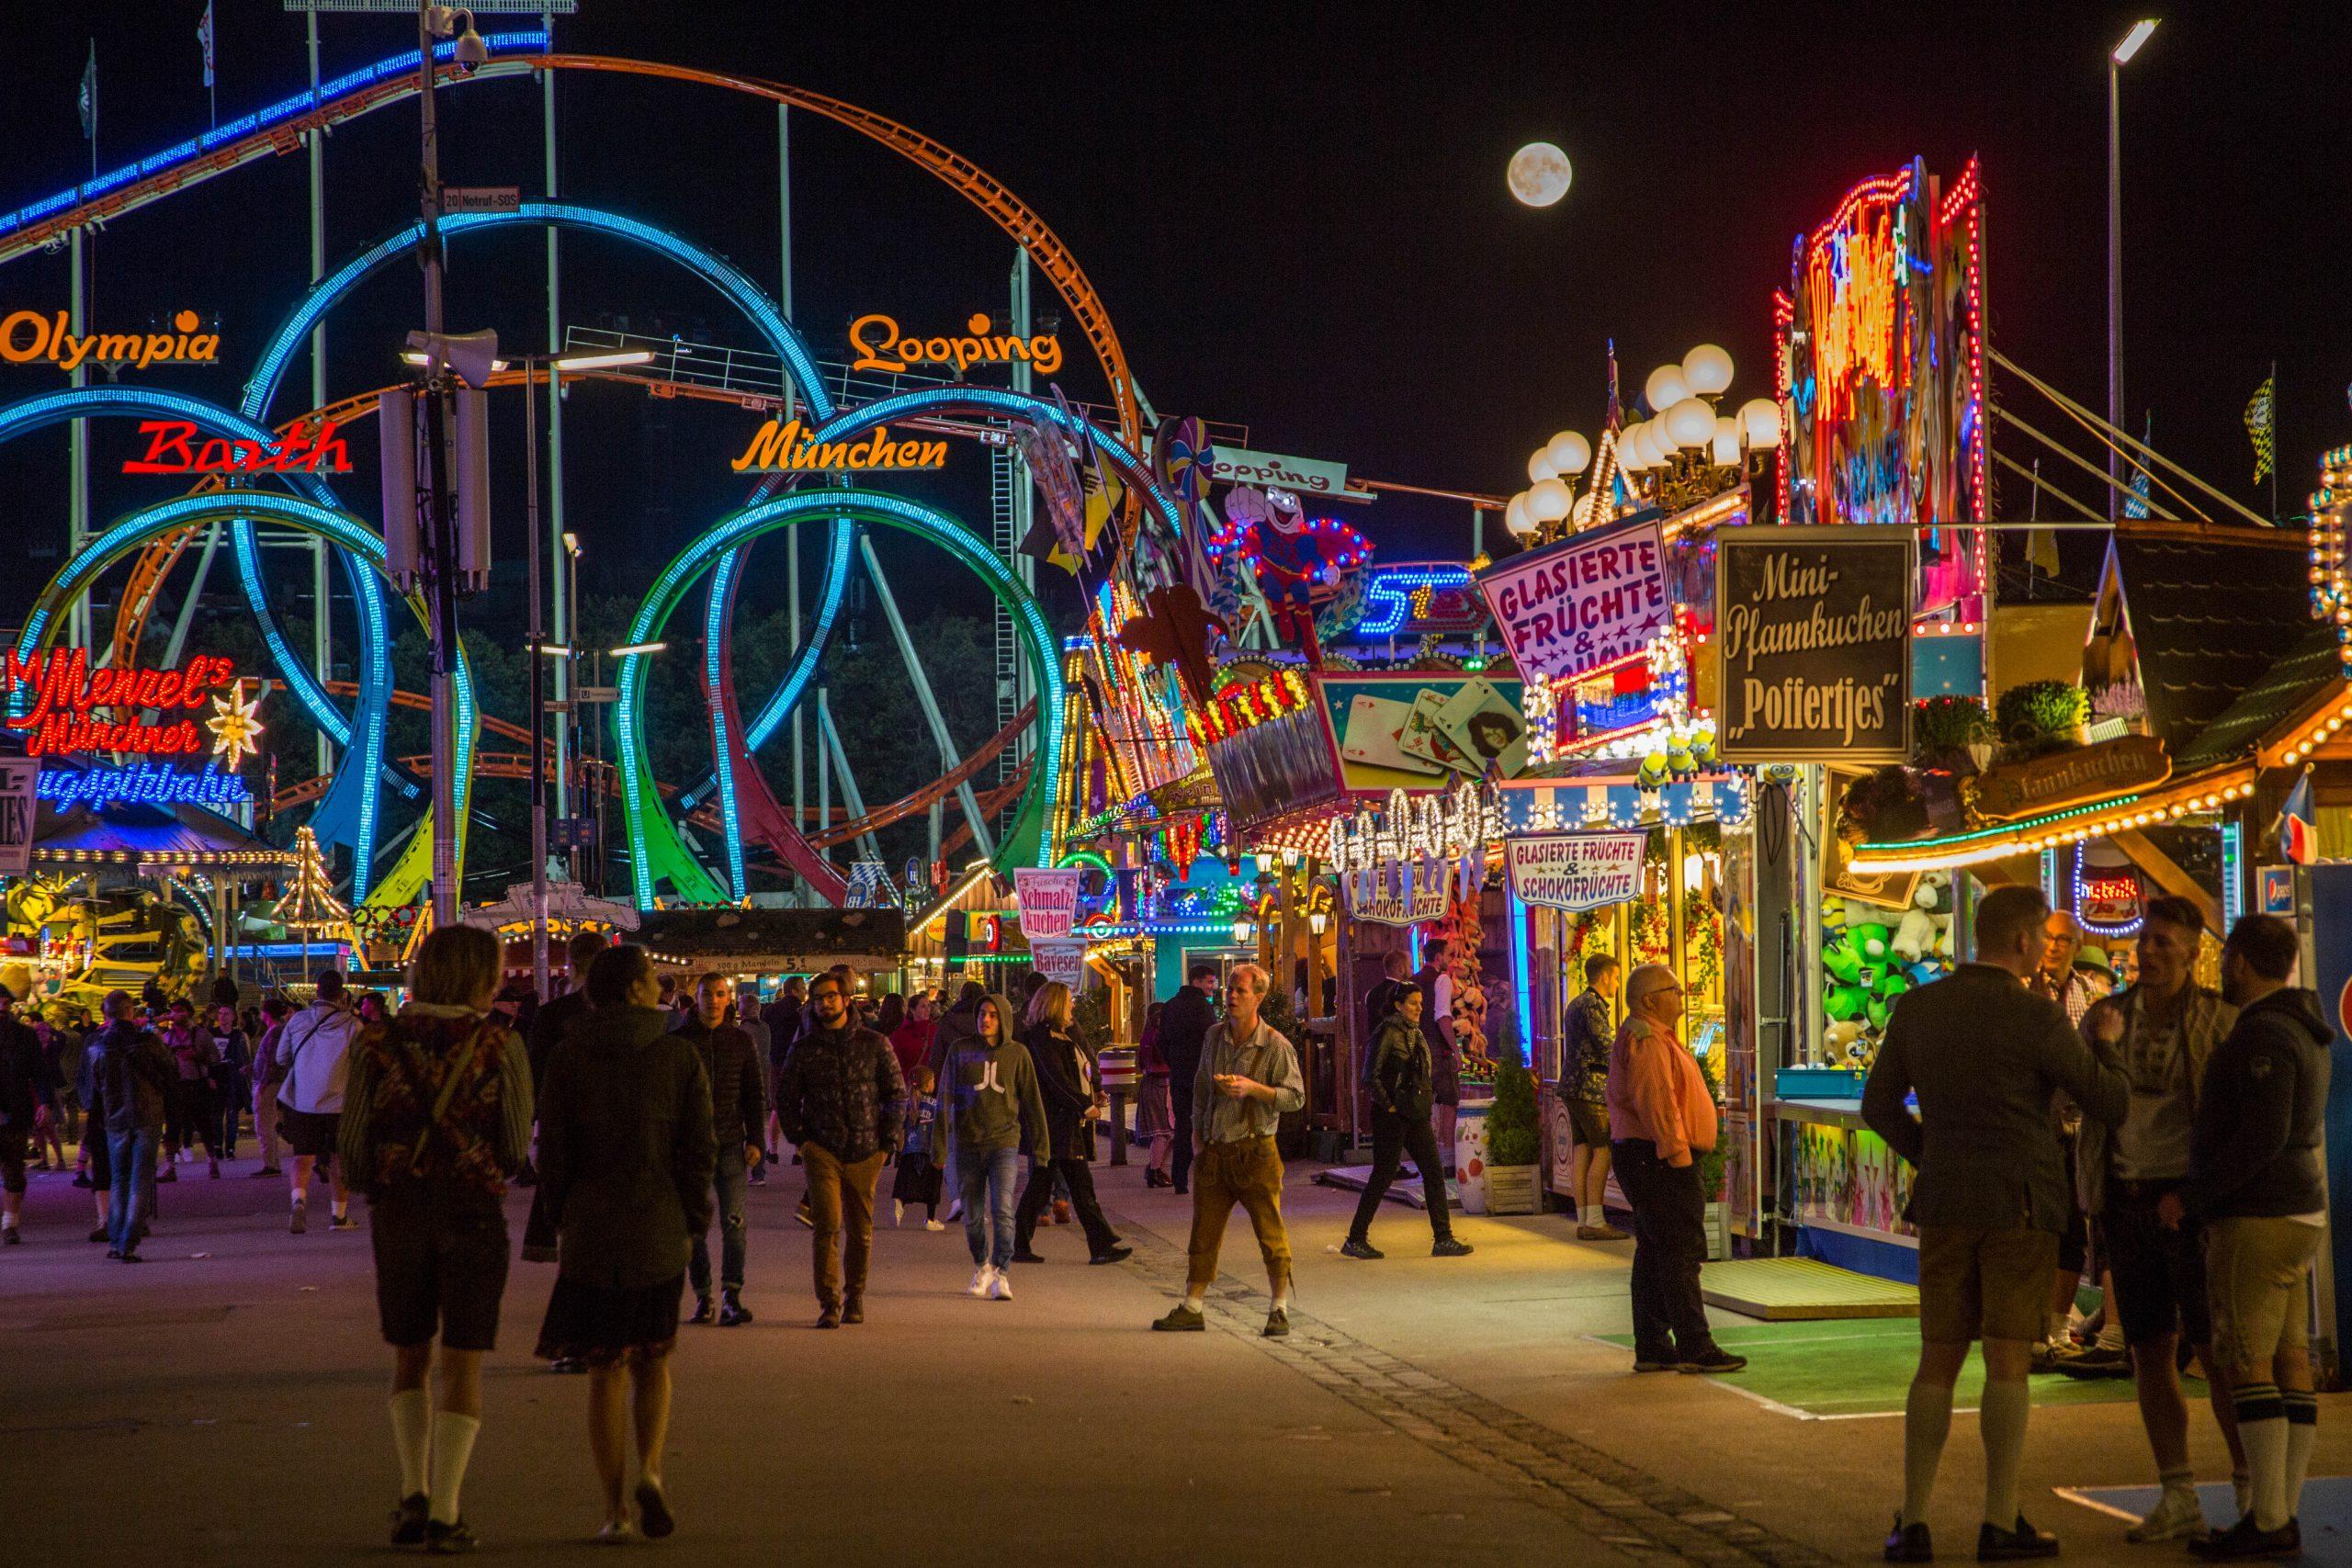 Springfest Munich by night